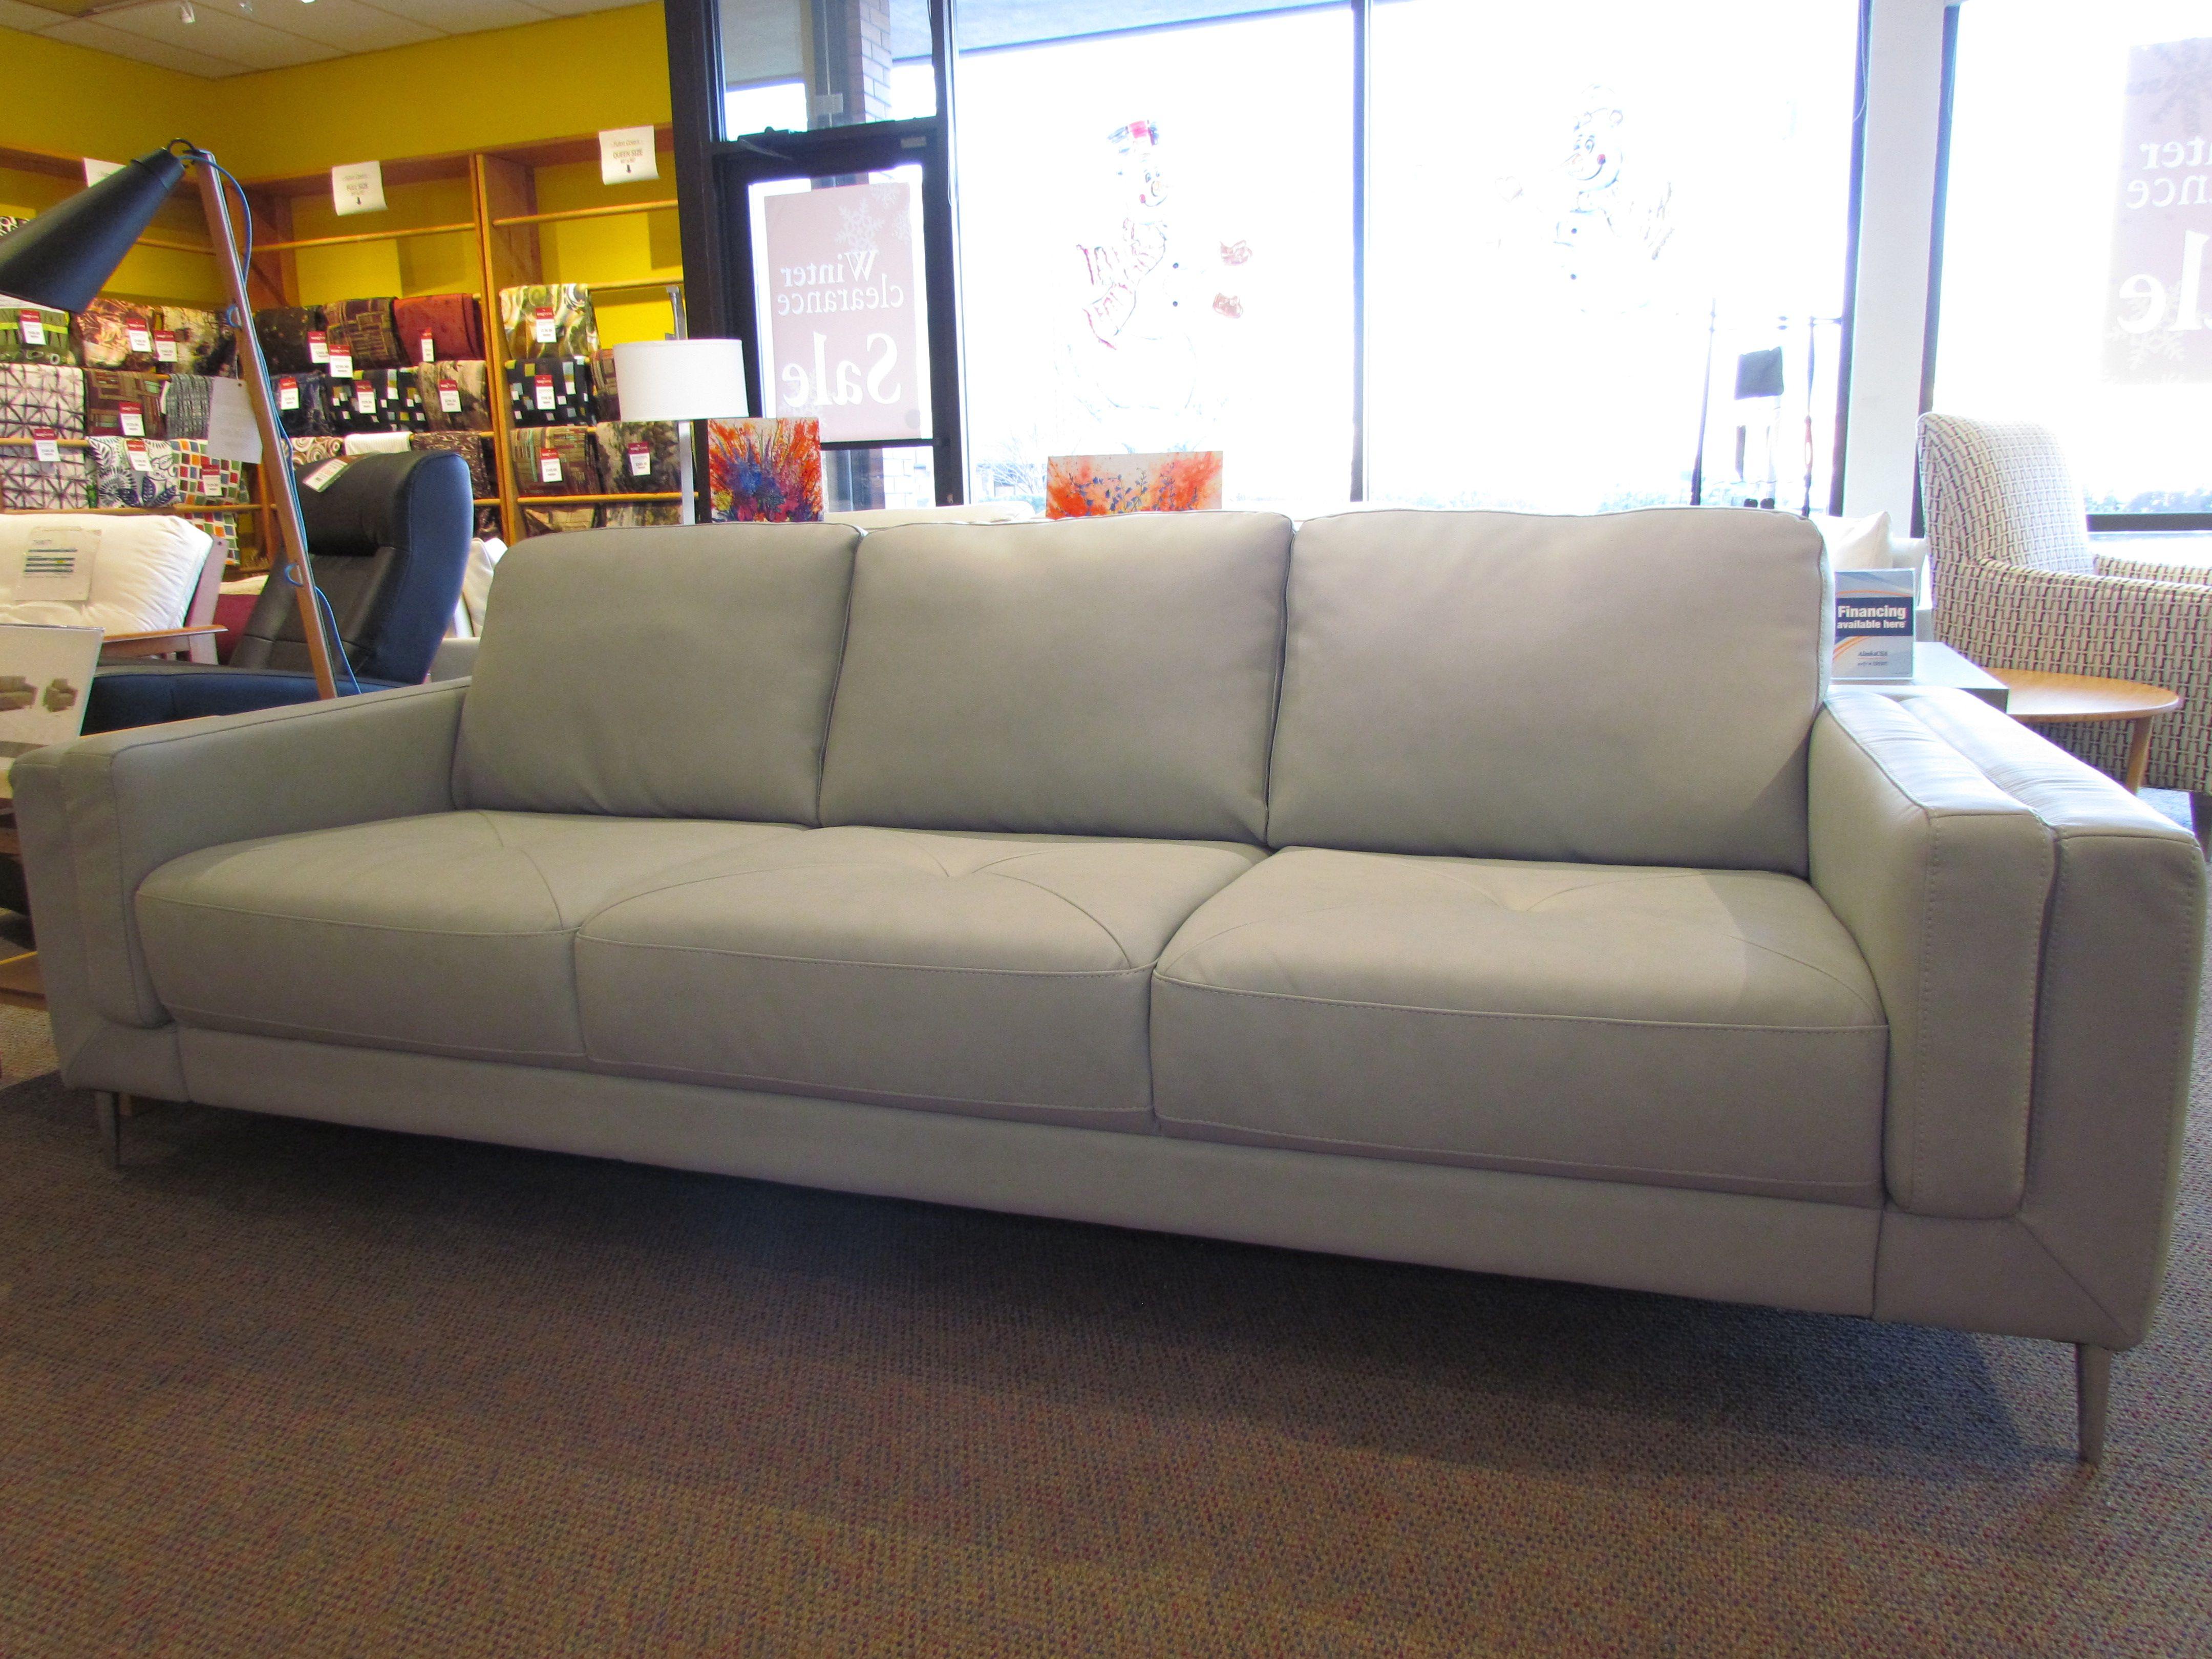 Zuri sofa by Palliser in Dax Ash Scan Home